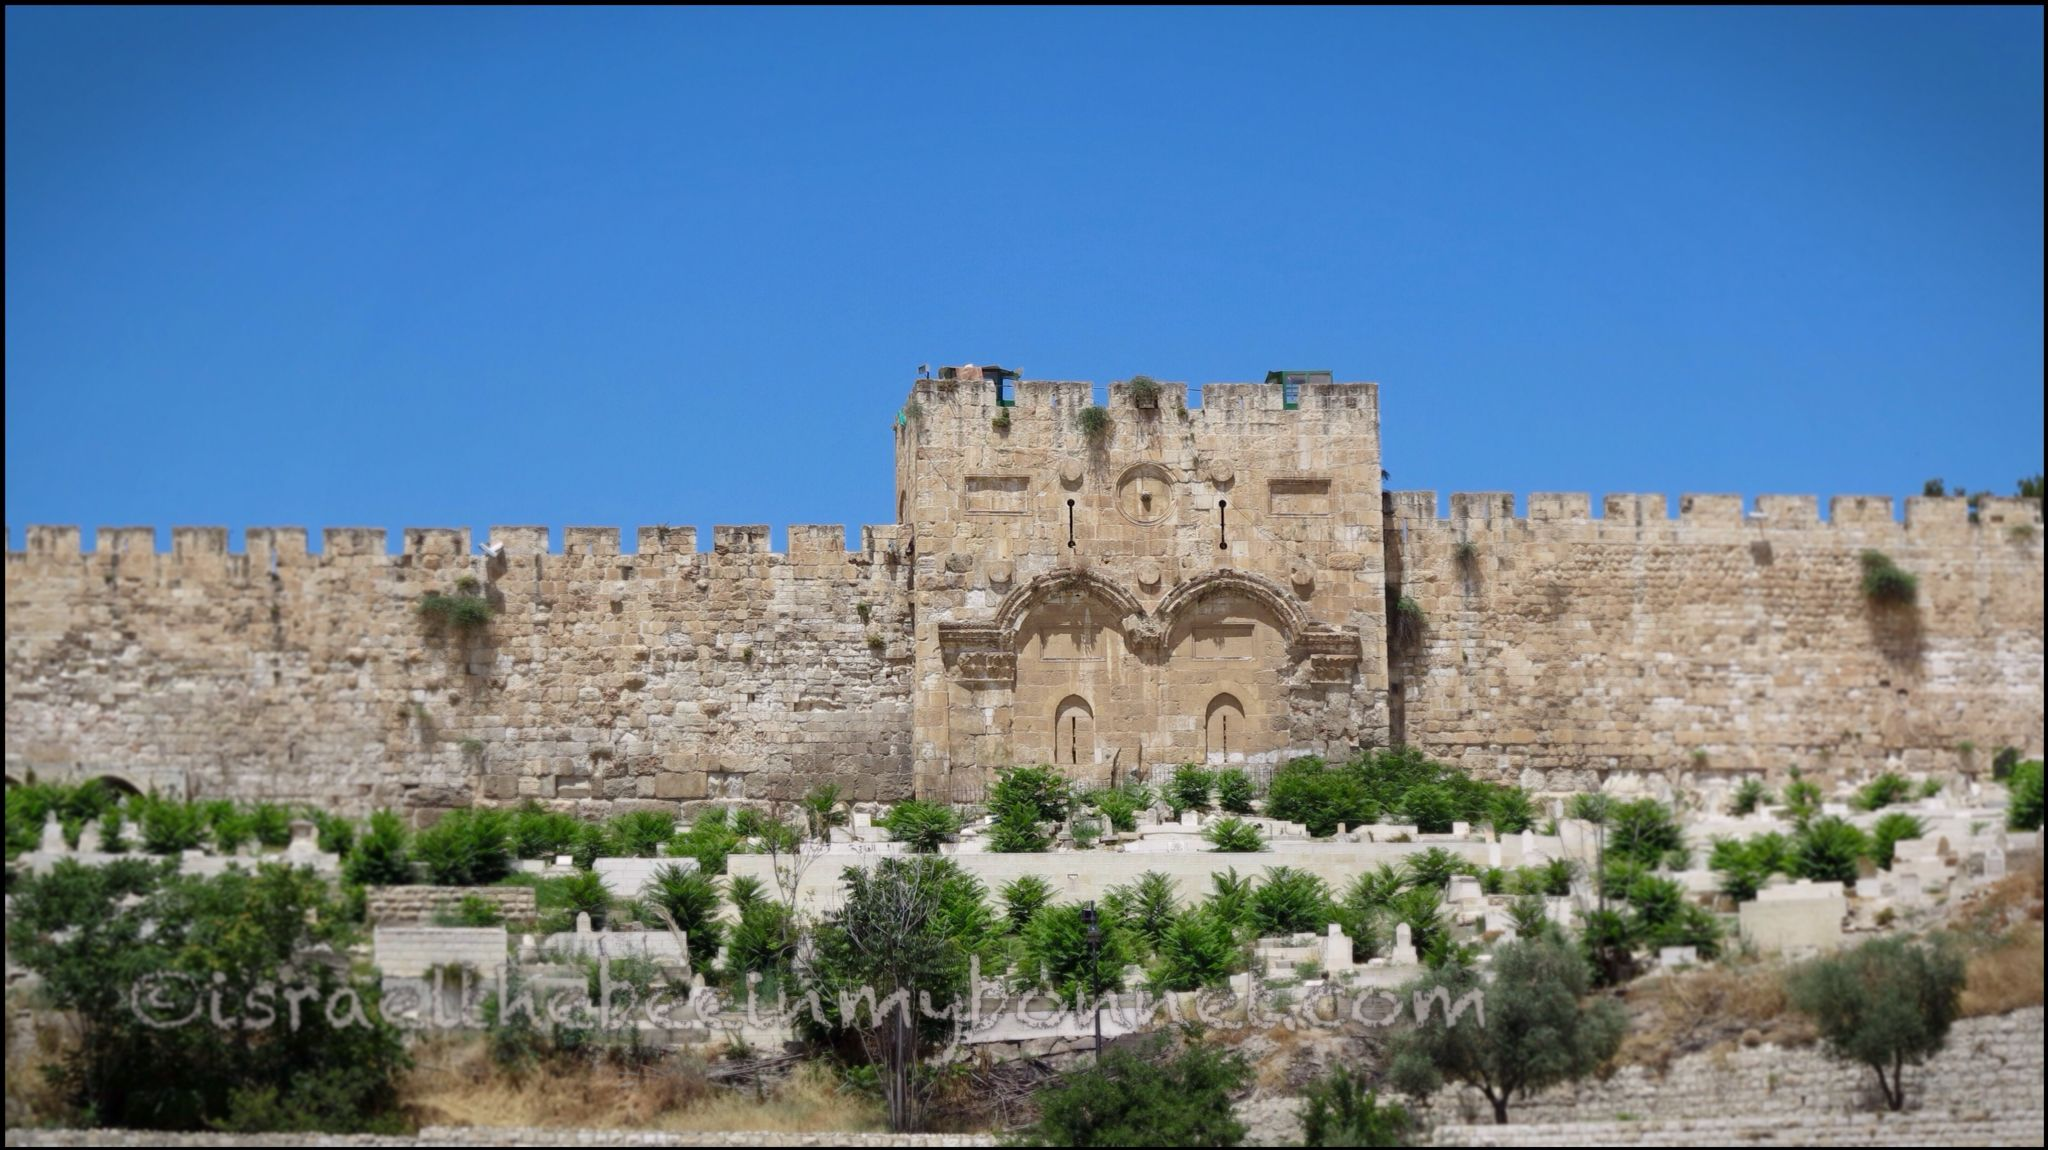 Golden Gate (Sha'ar HaRahamim in Hebrew - Gate of Mercy), Old City, #Jerusalem, #Israel.